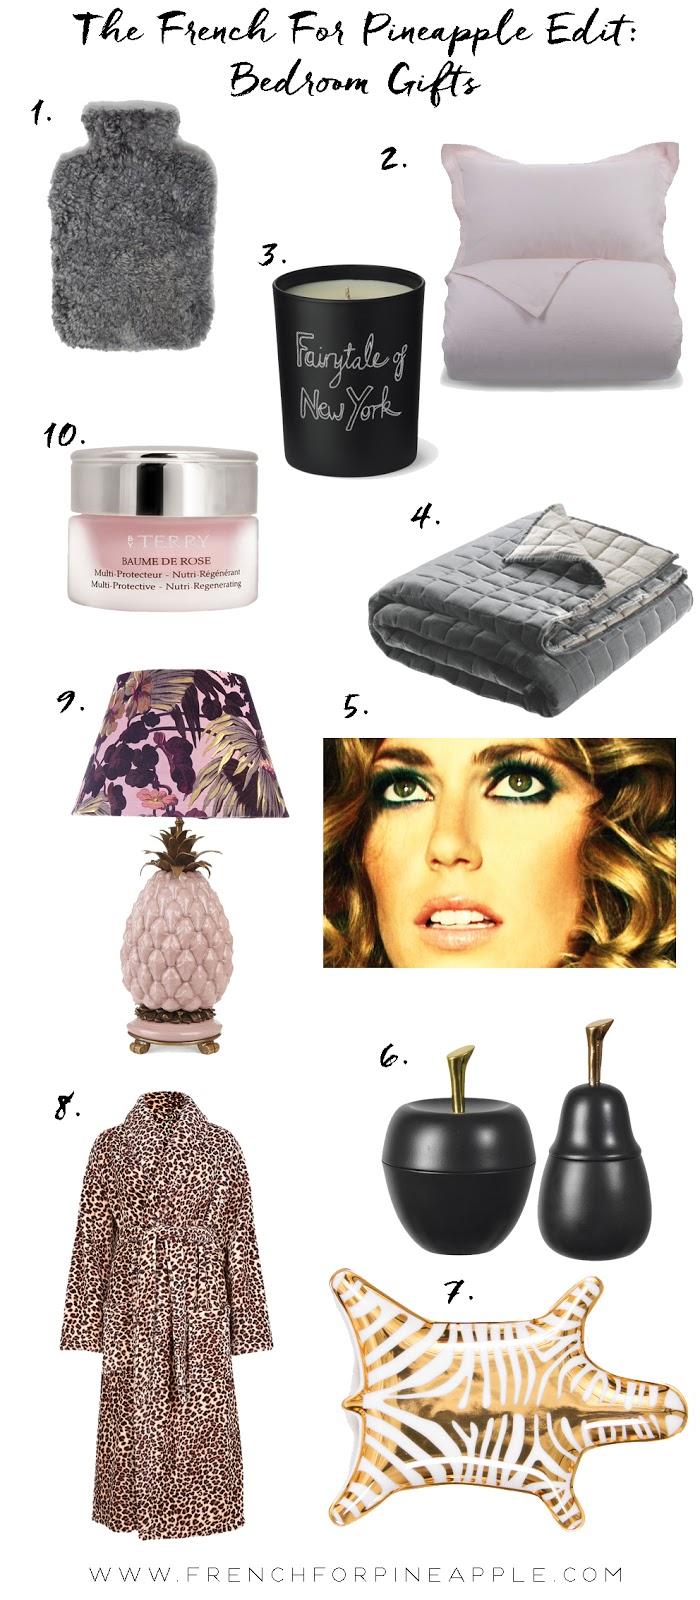 French For Pineapple Blog - Bedroom Gift Guide